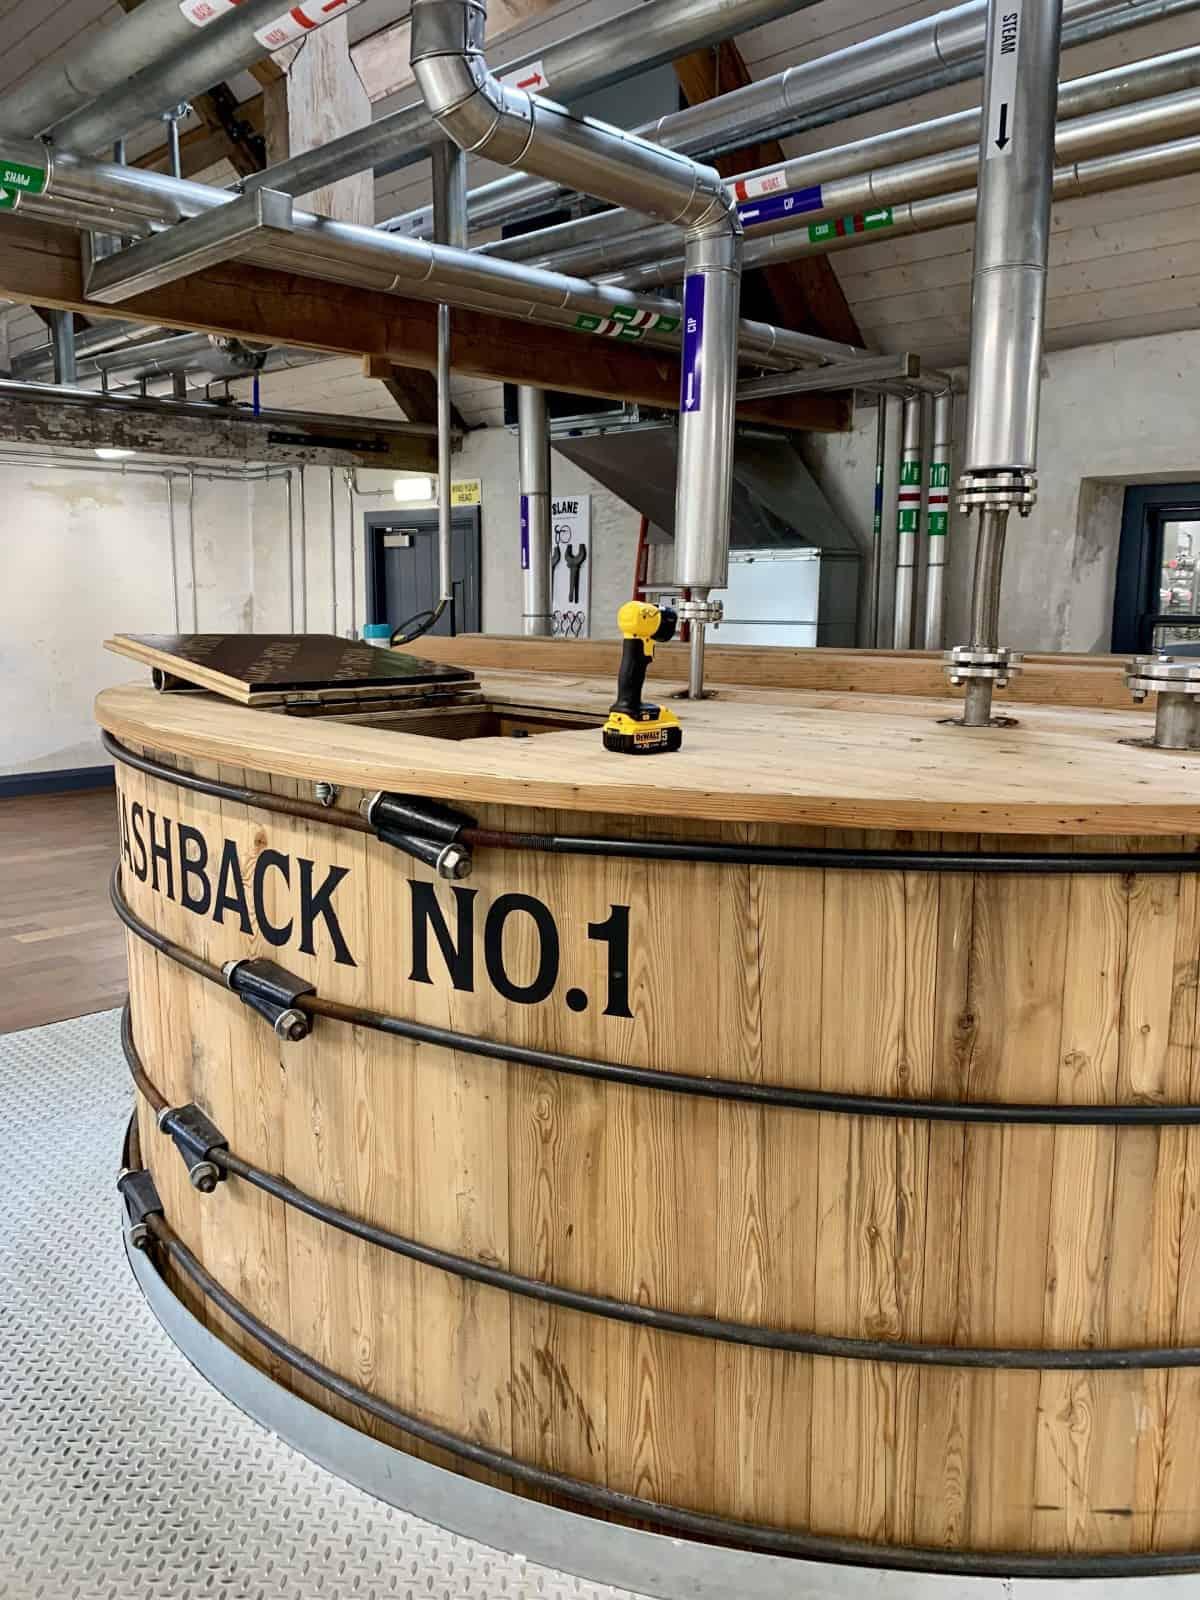 Visiting Ireland's Slane Distillery & Castle - a tour of the whiskey distillery